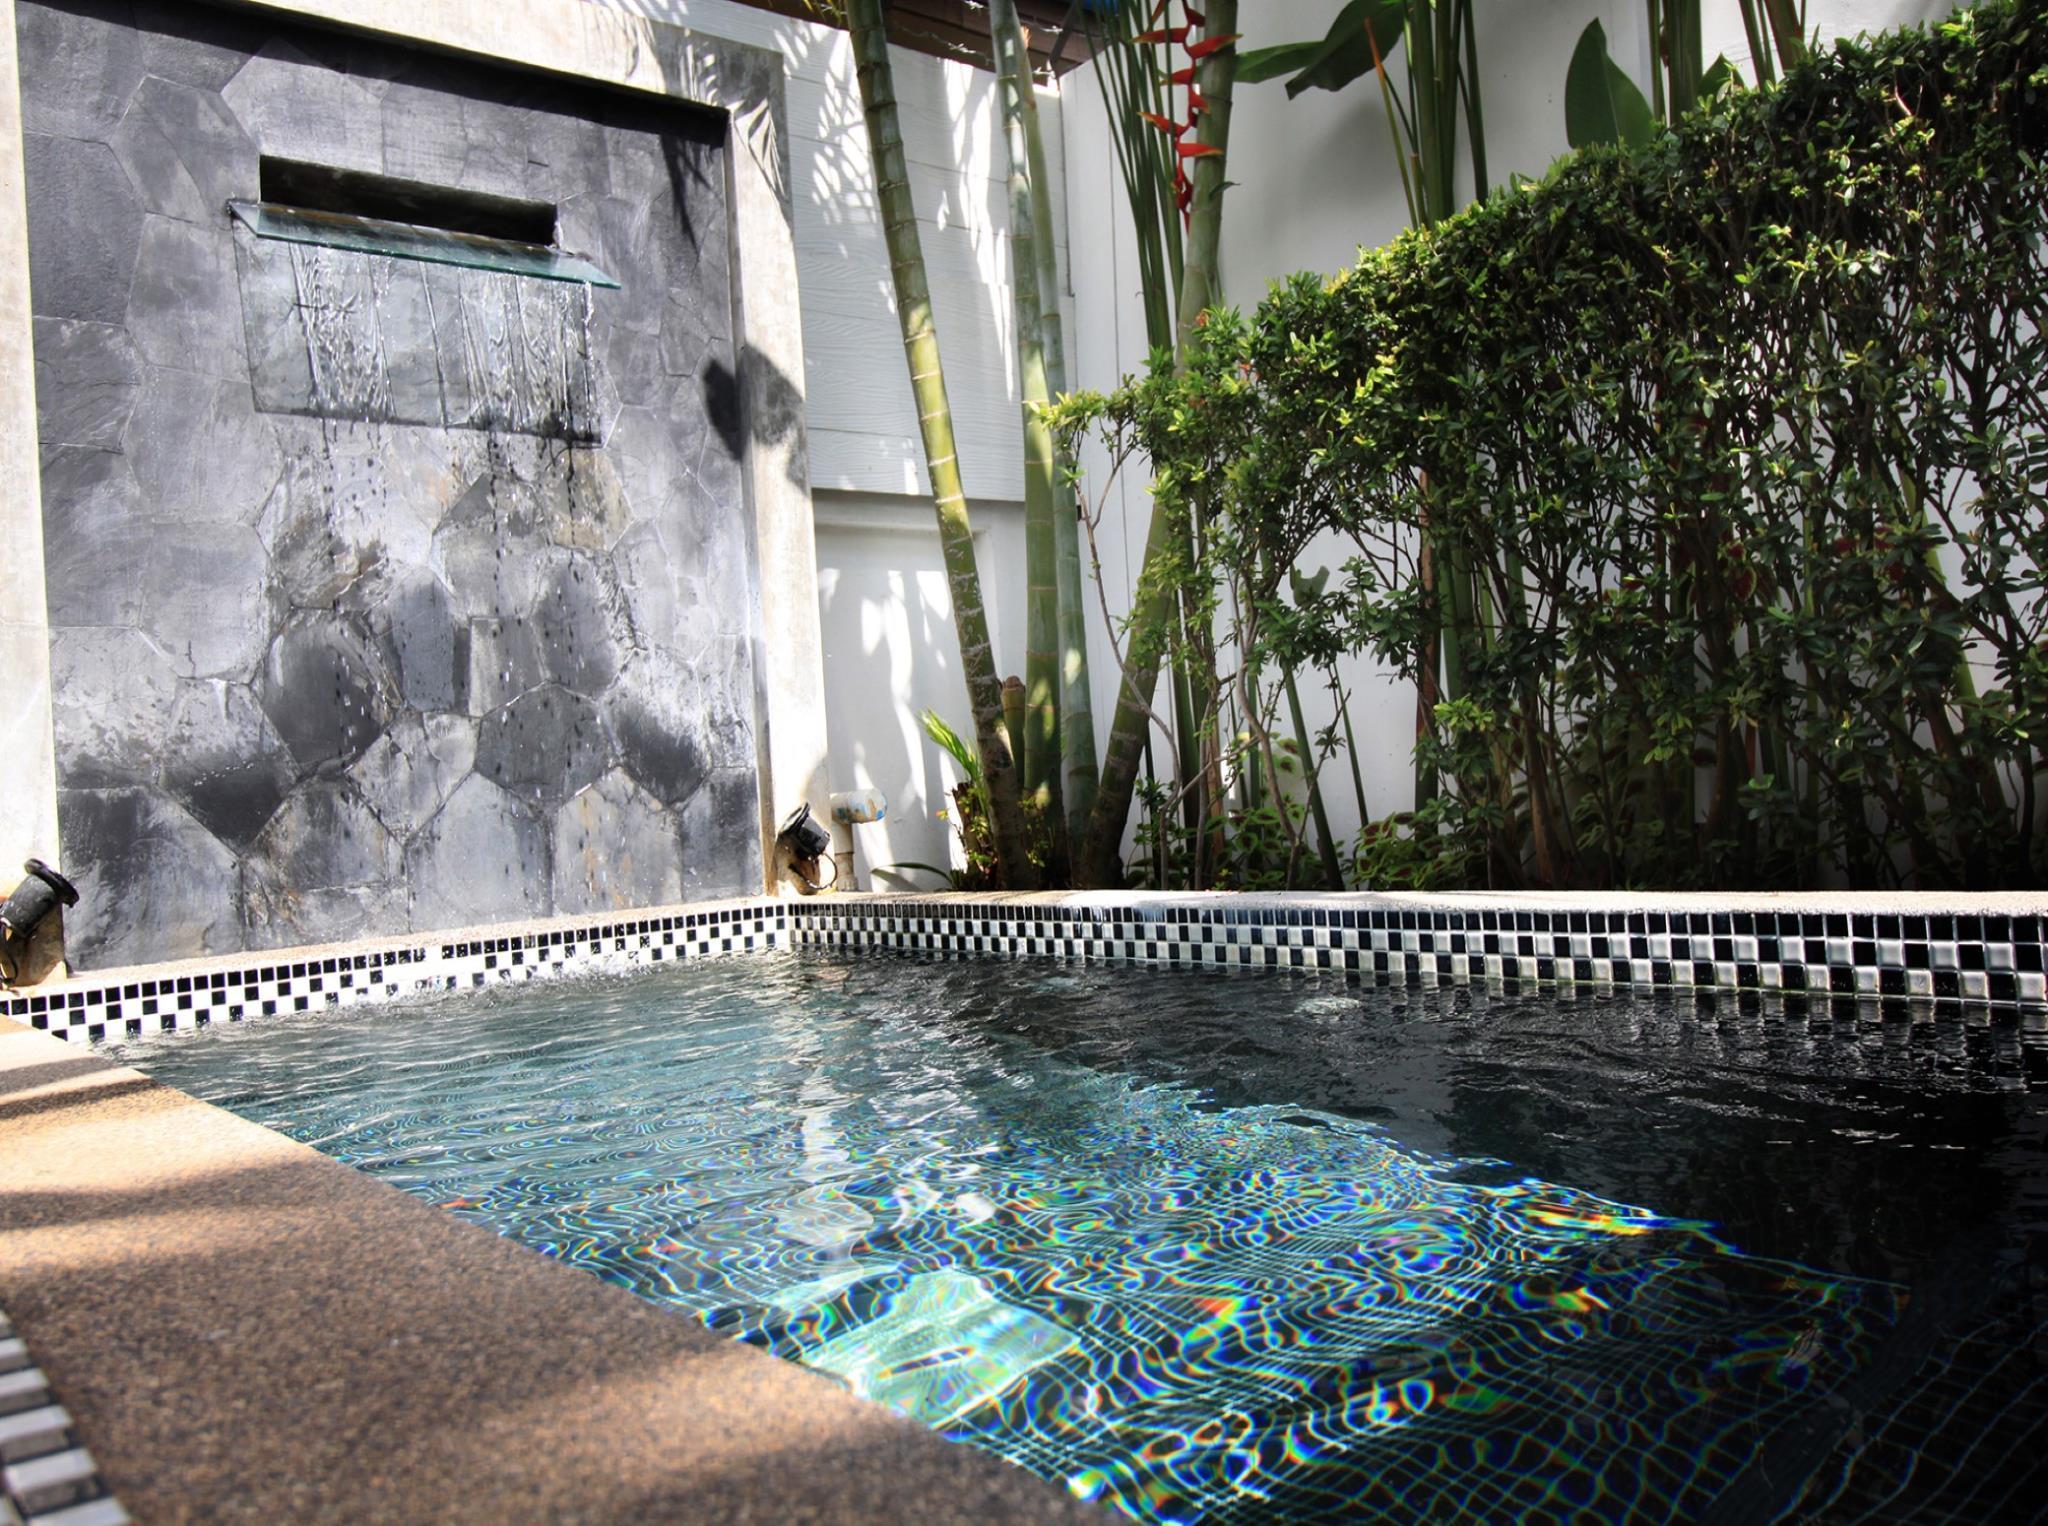 Coconut Grove Boutique Hotel โคโคนัท โกรฟ บูทิก โฮเต็ล